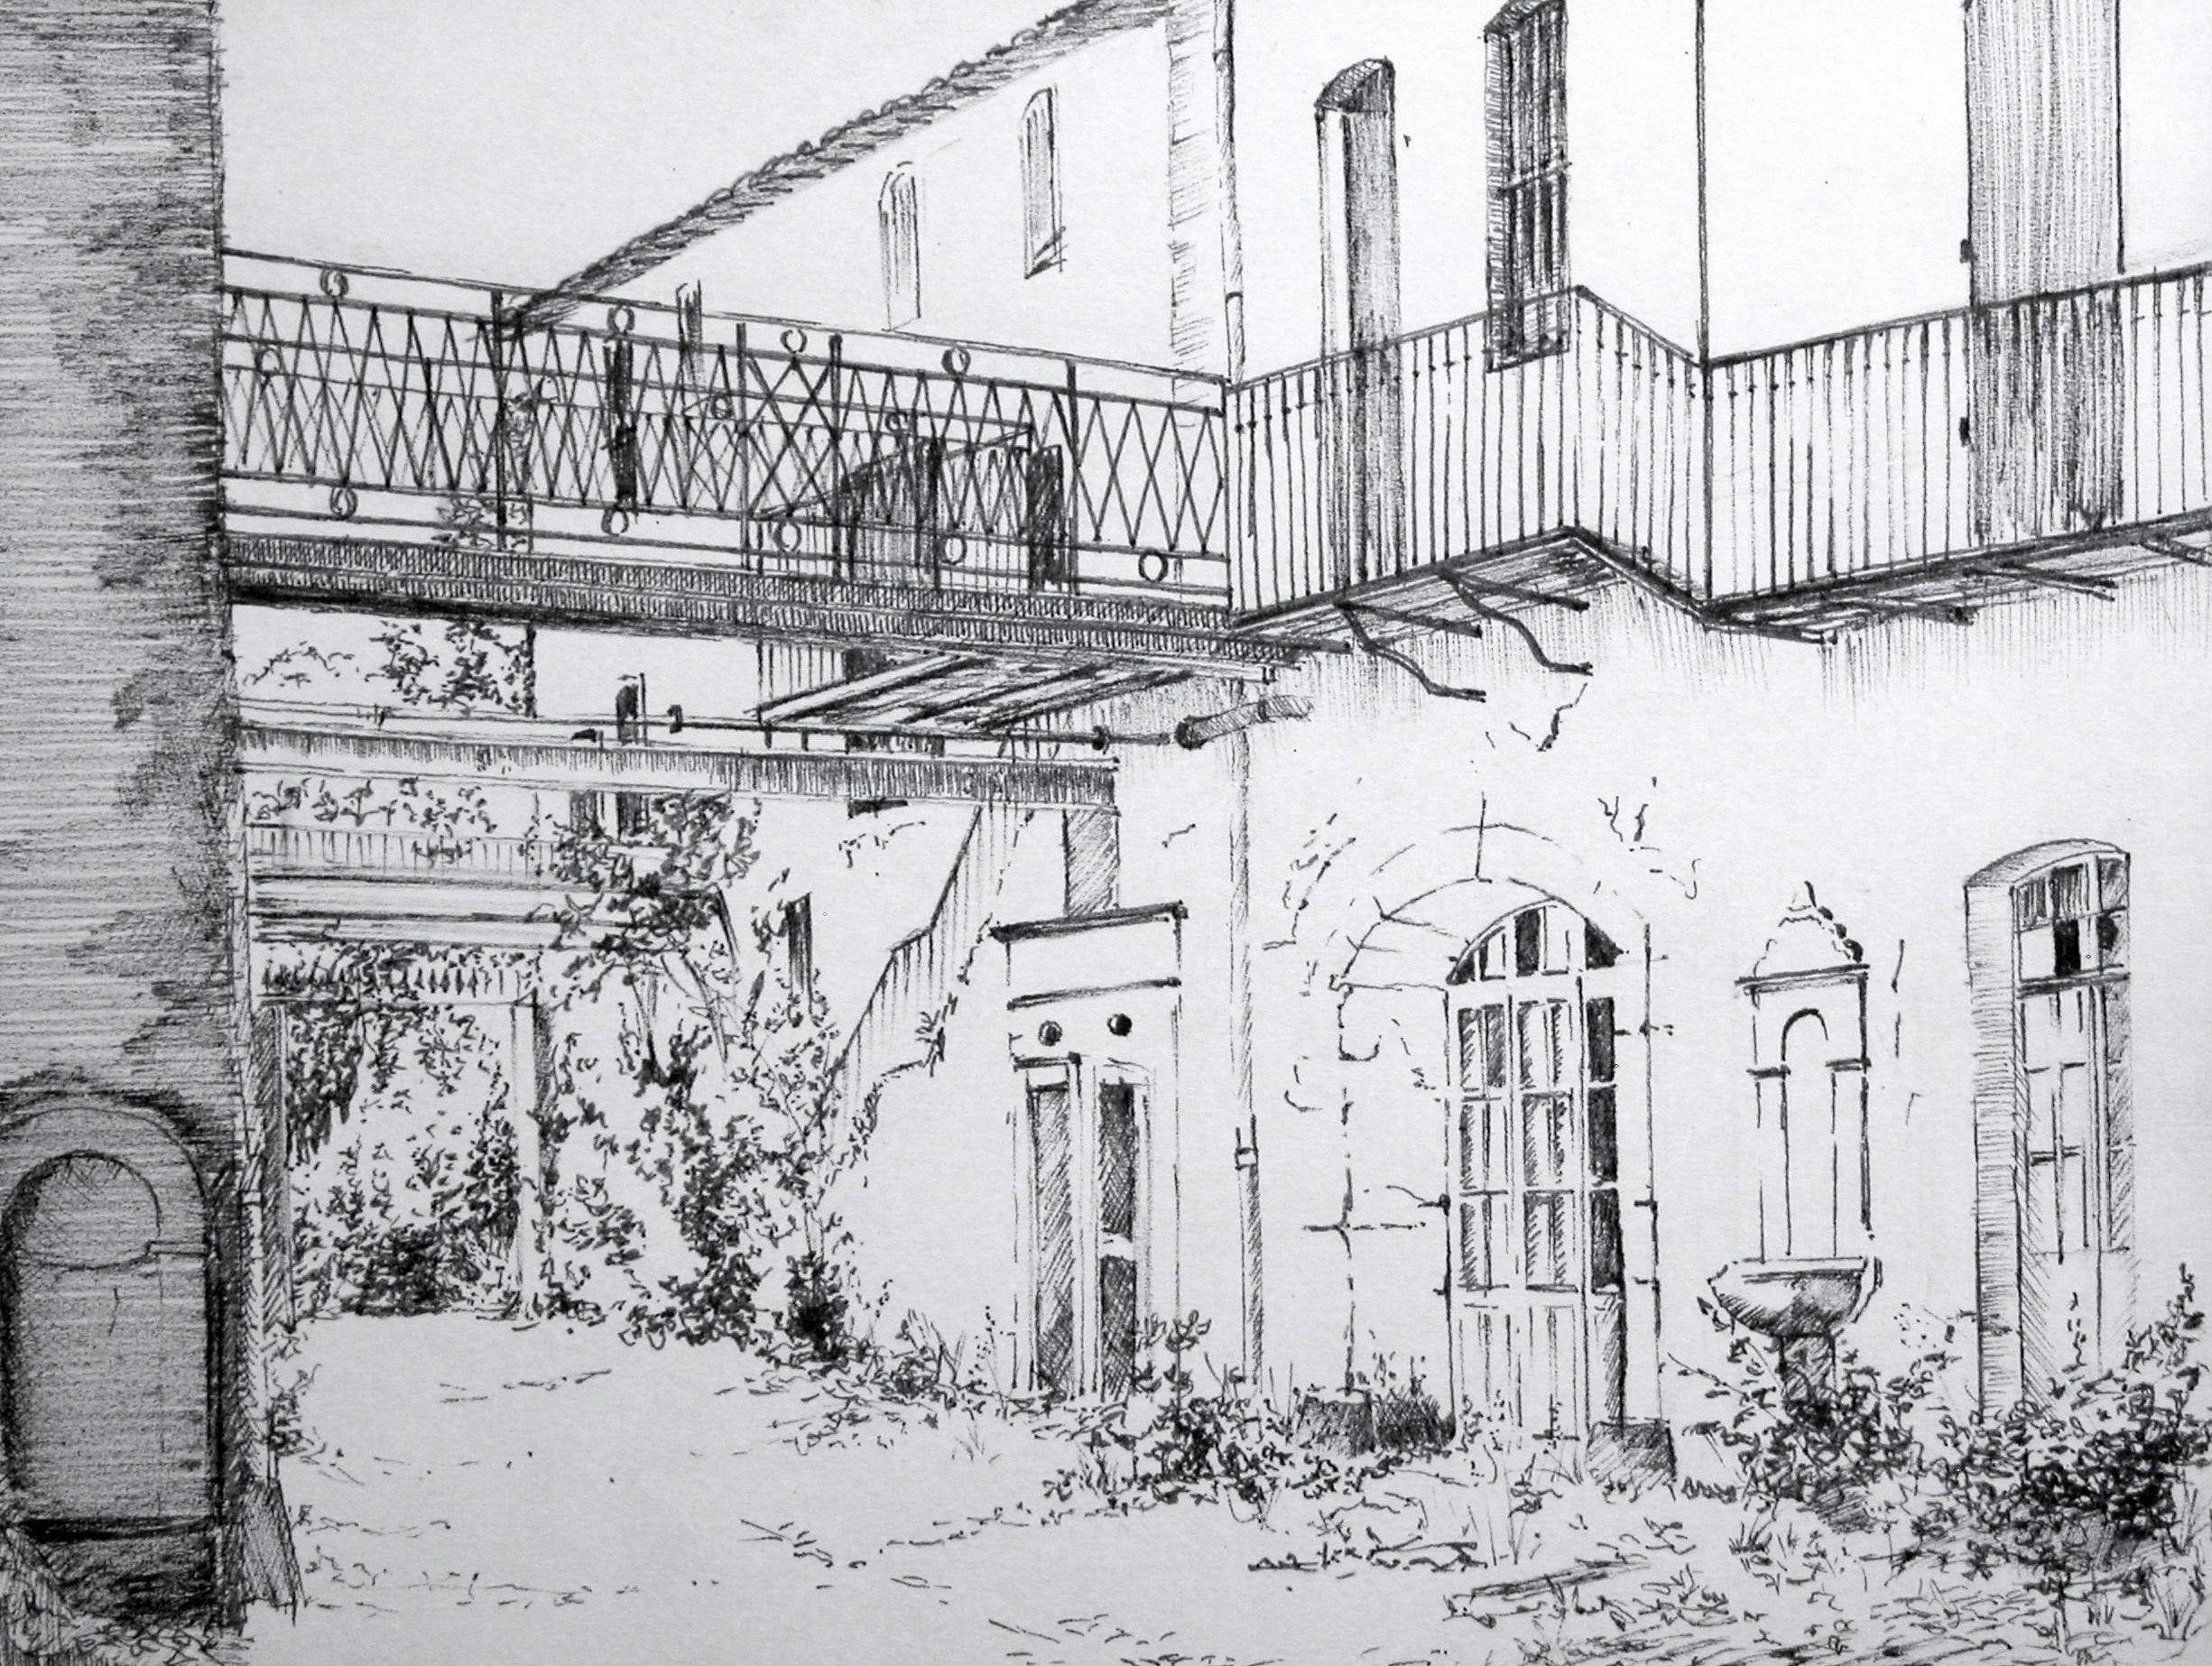 Gilou, Villeneuvette usine